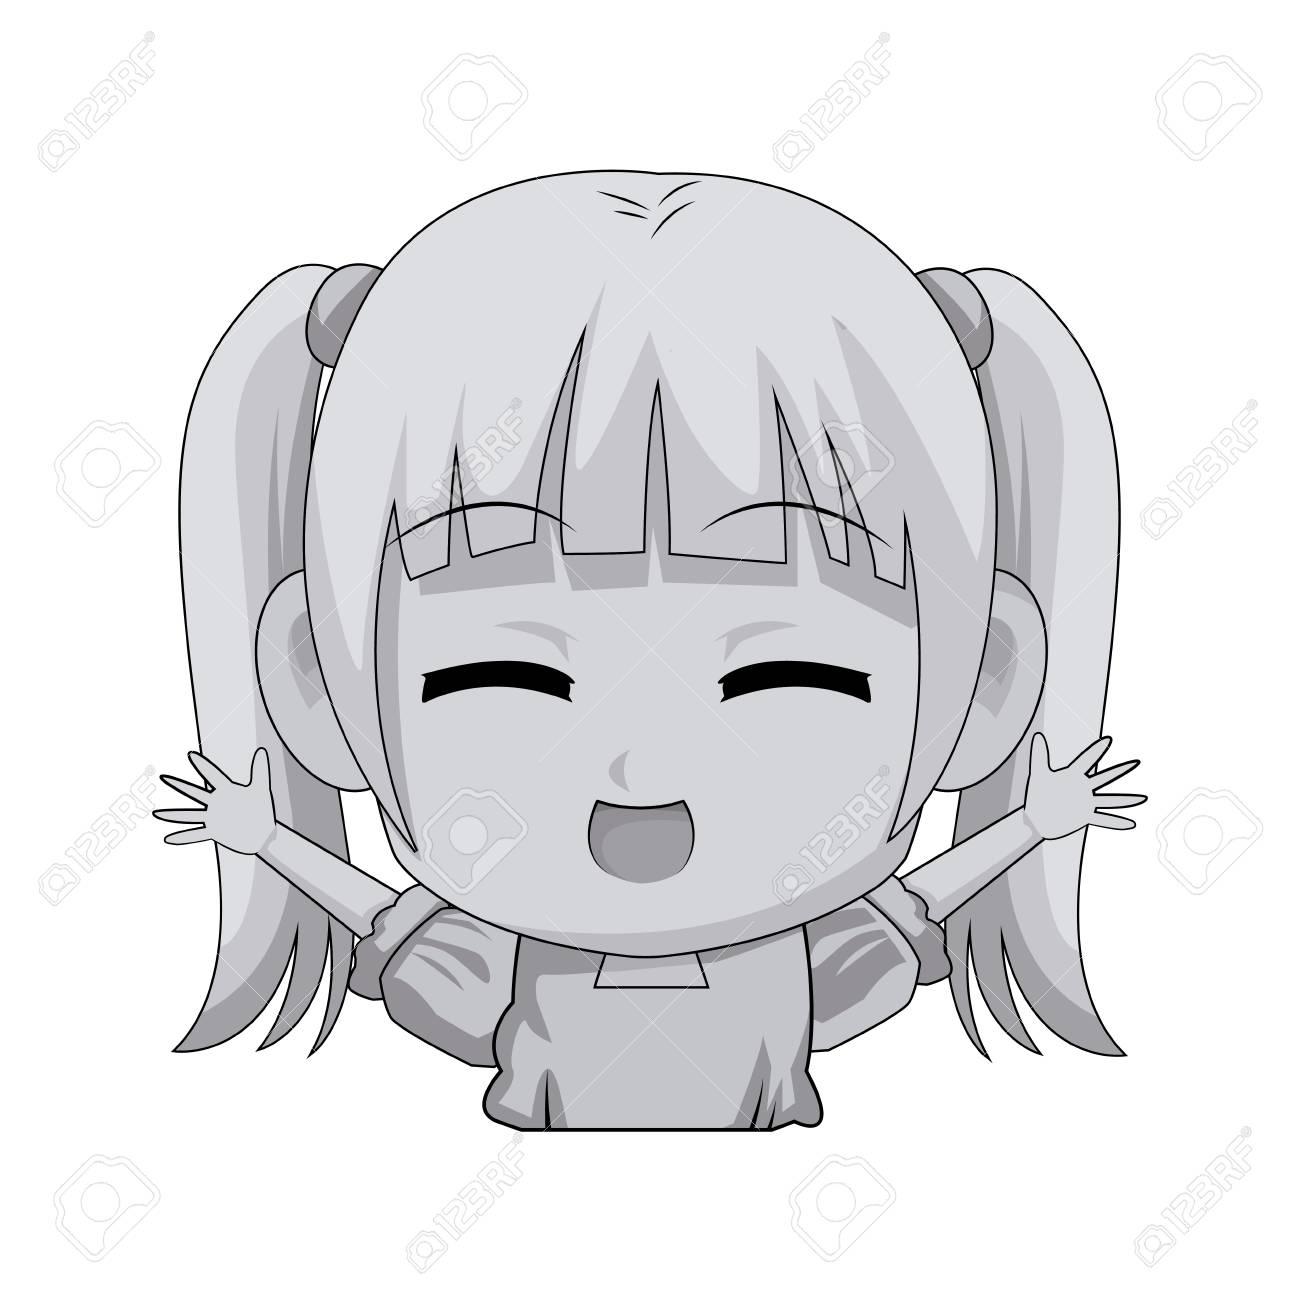 Cute Cartoon Anime Little Girl Chibi Character Vector Illustration